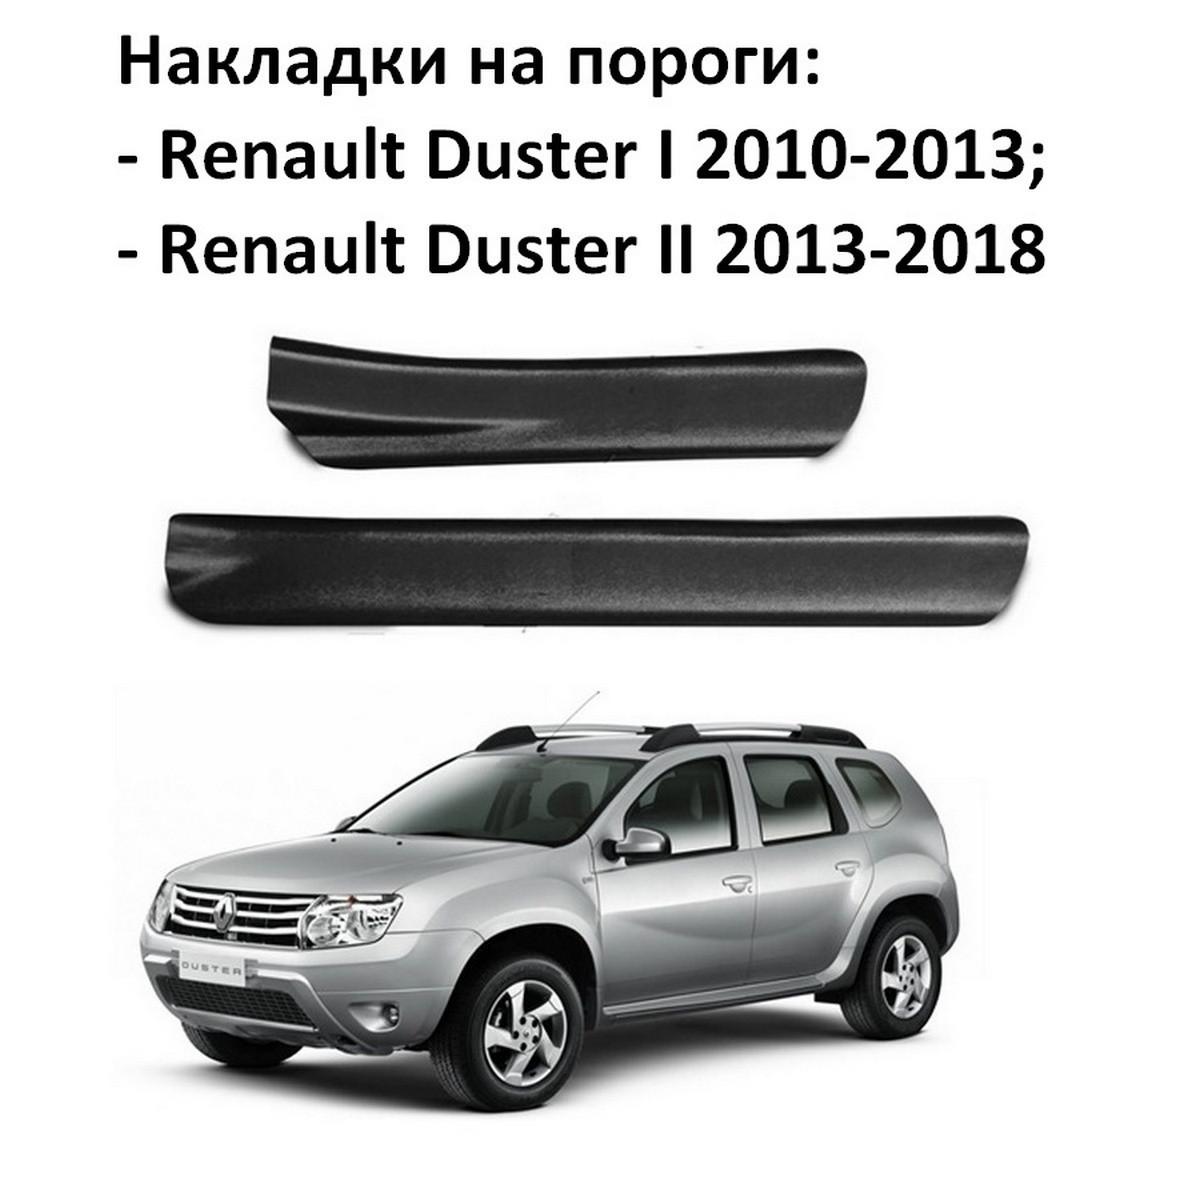 Накладки на пороги Renault Duster